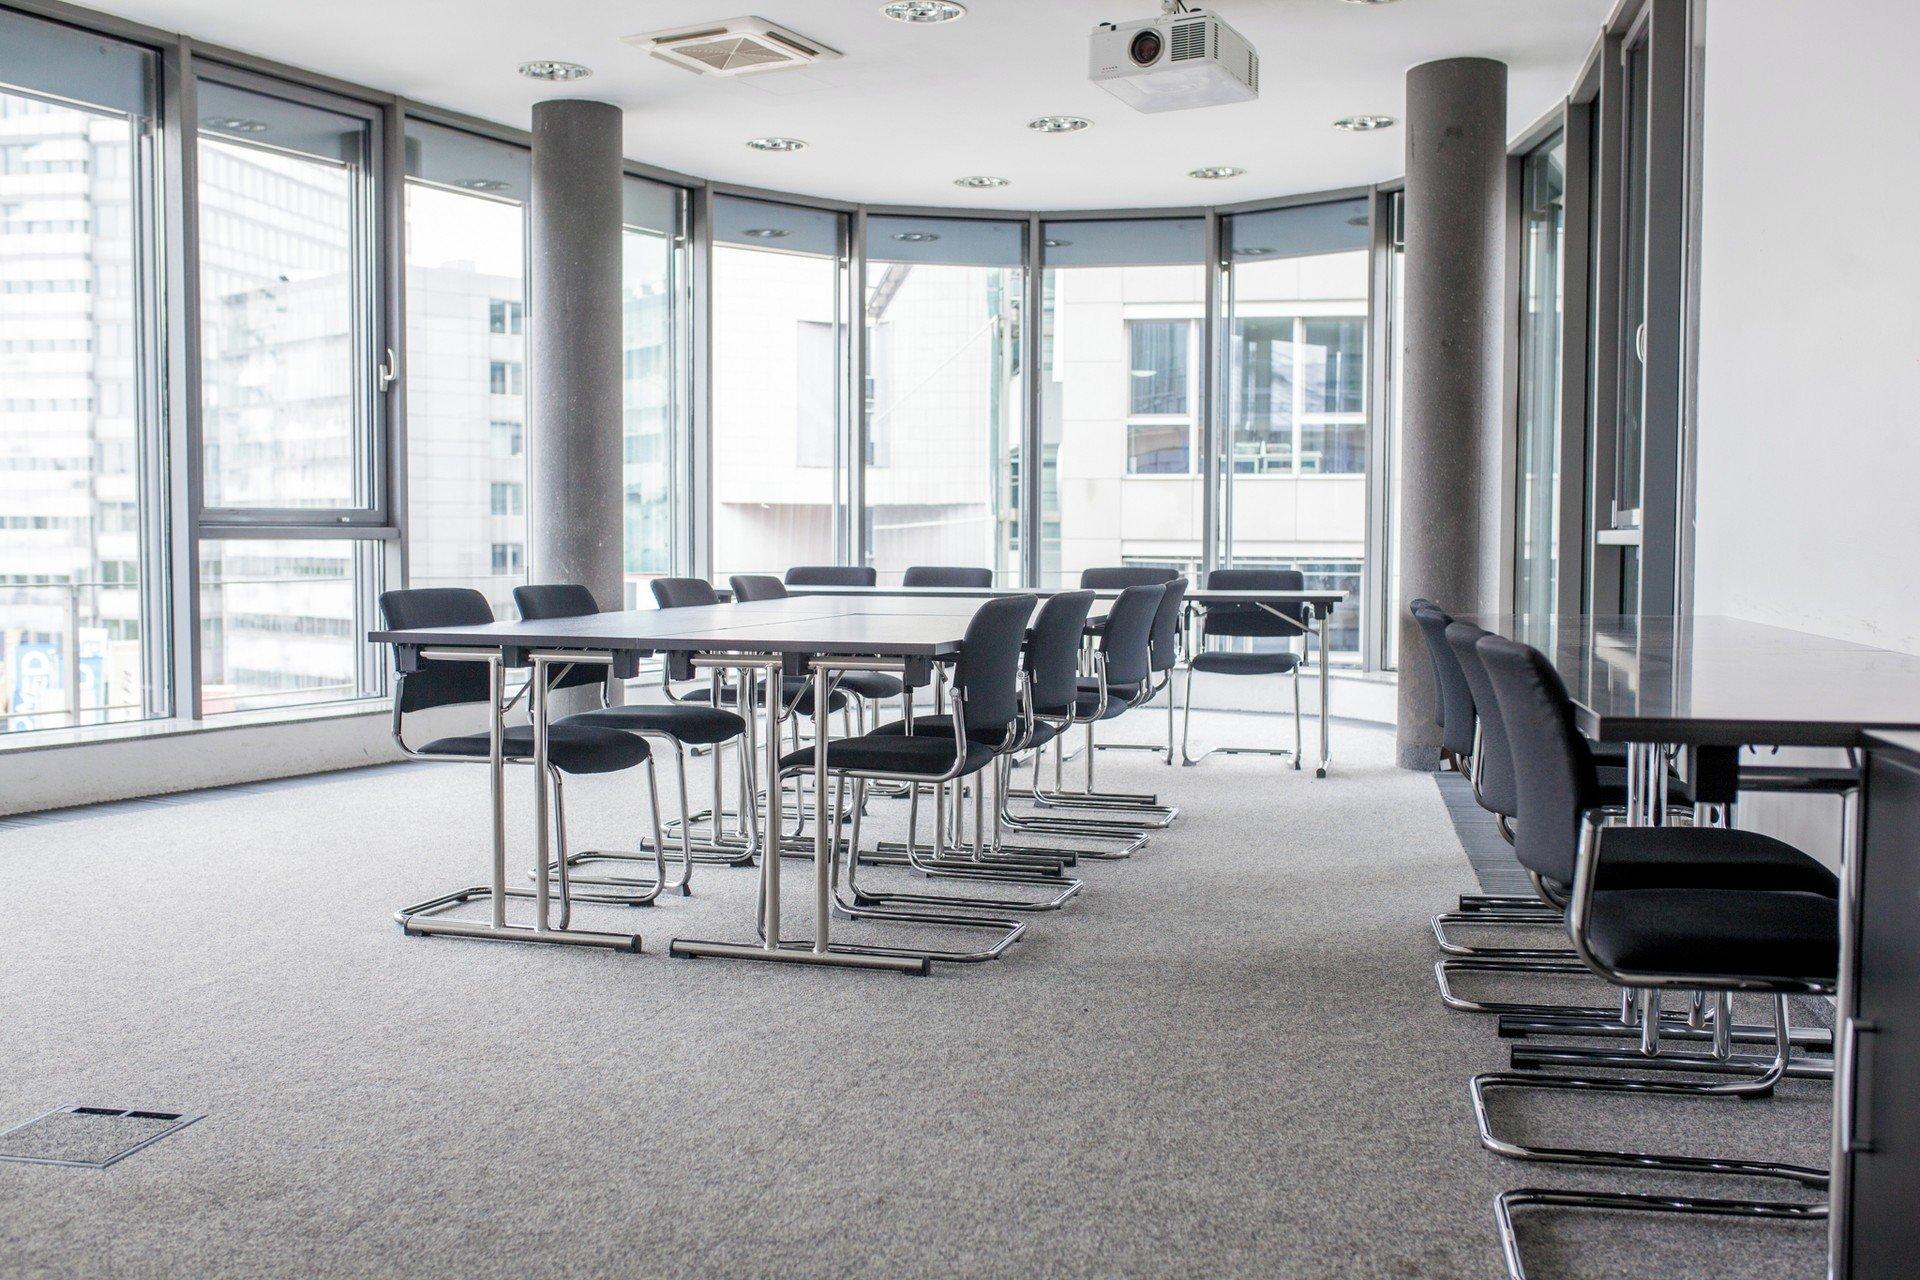 Cologne Schulungsräume Meeting room Startplatz- San Francisco Room image 5